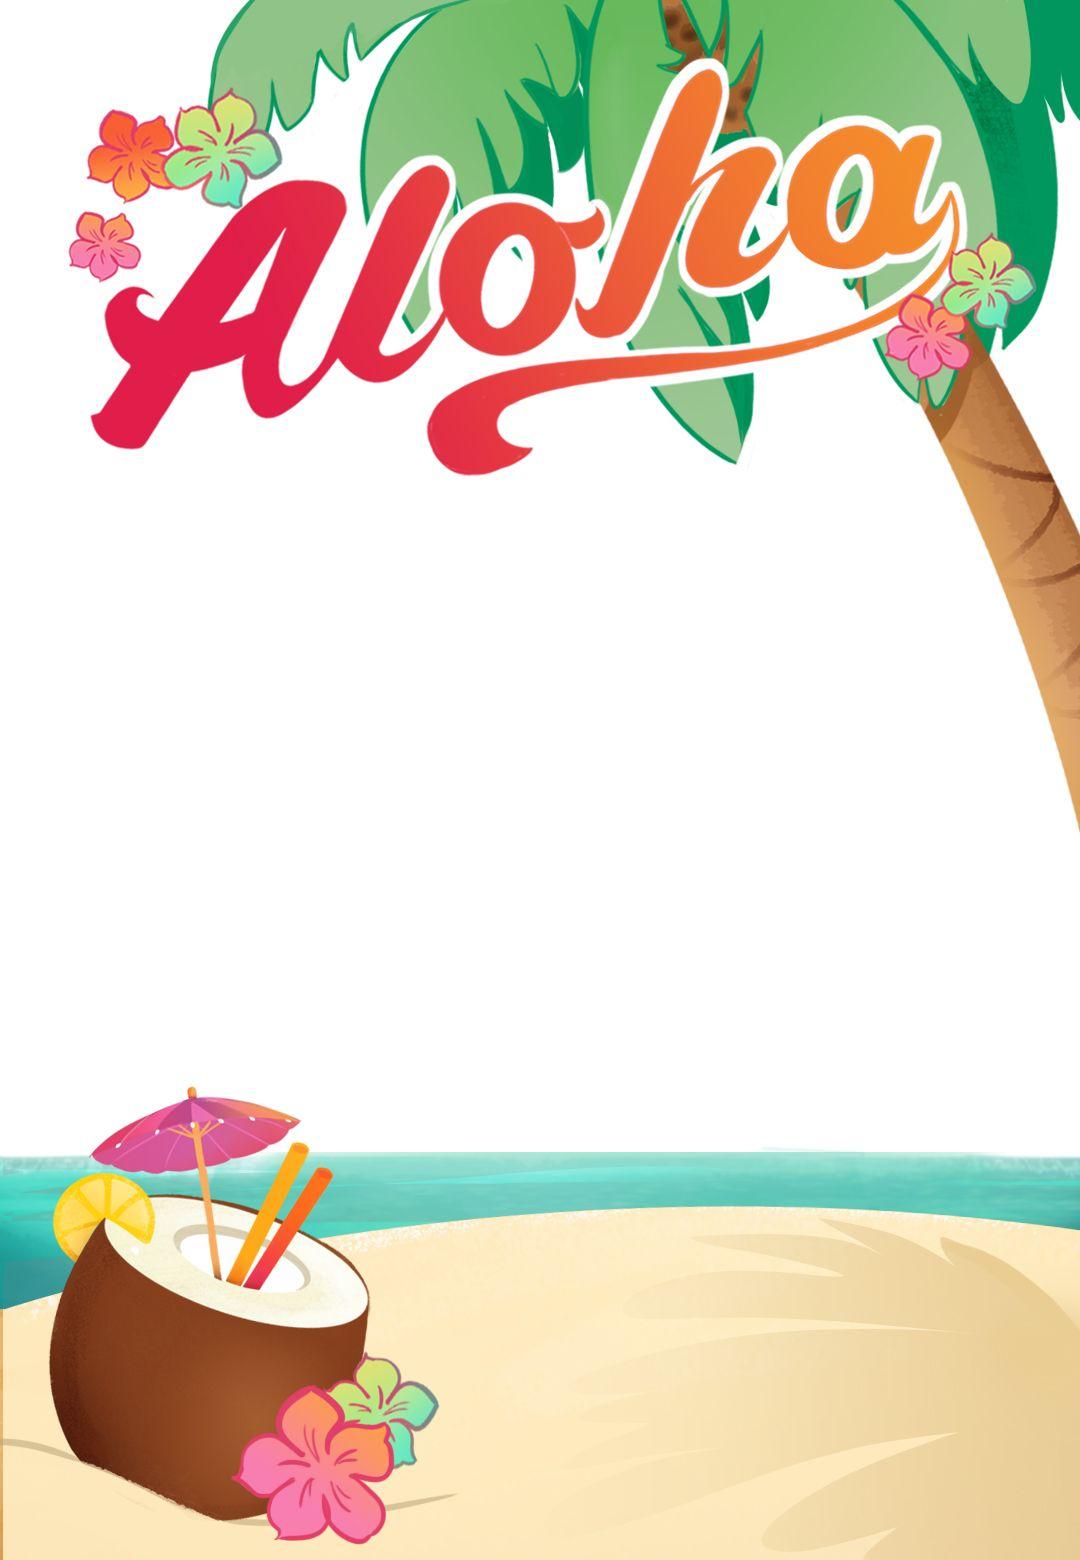 Luau Party - Free Printable Summer Party Invitation Template - Free Printable Luau Baby Shower Invitations